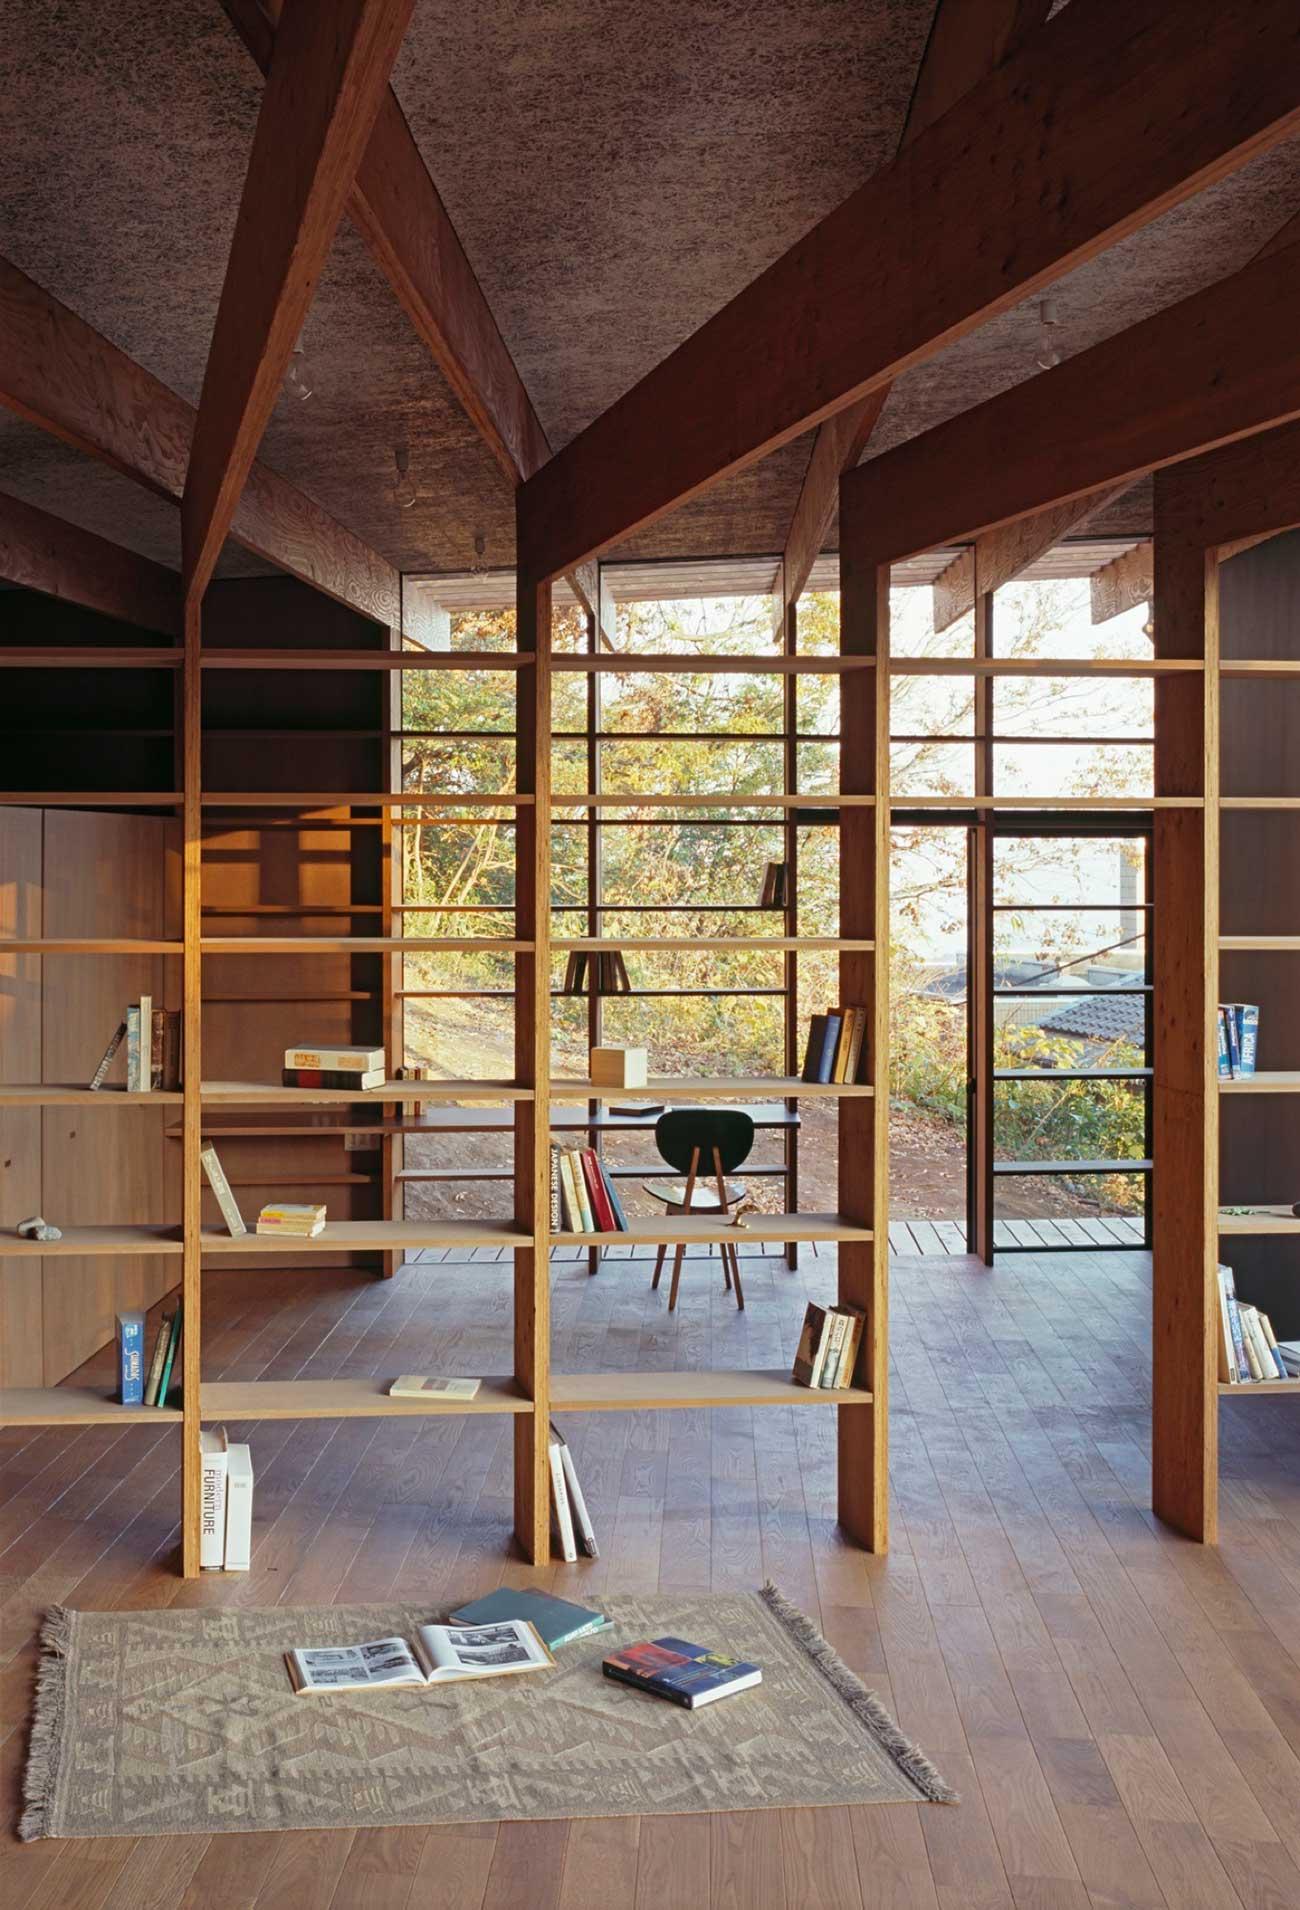 Geo Metria By Mount Fuji Architects Studio, Kanagawa, Japan | Yellowtrace.